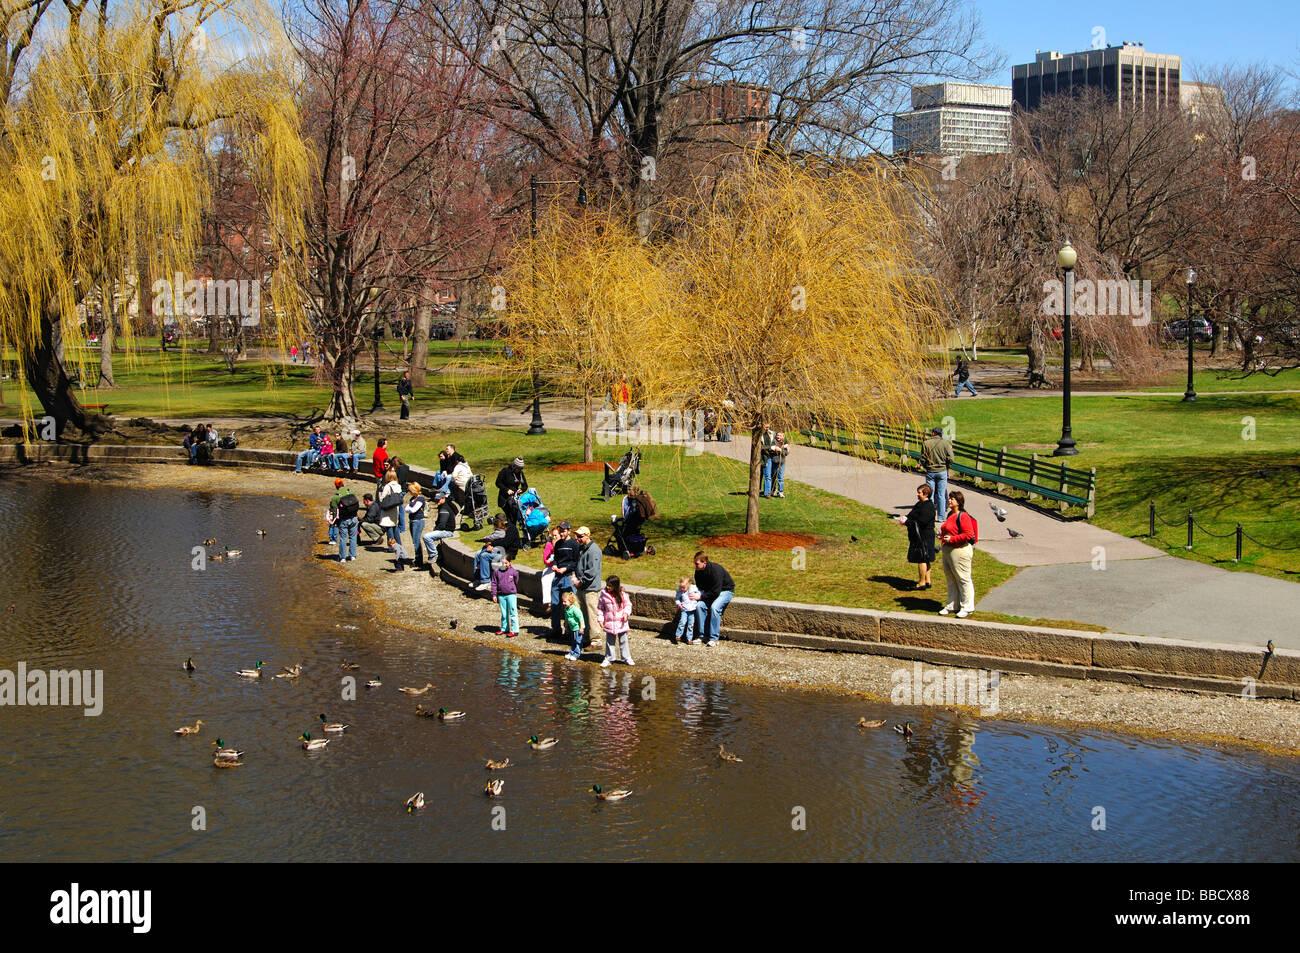 Families with kids feeding ducks in the Lagoon of the Public Garden of Boston, Massachusetts, USA - Stock Image